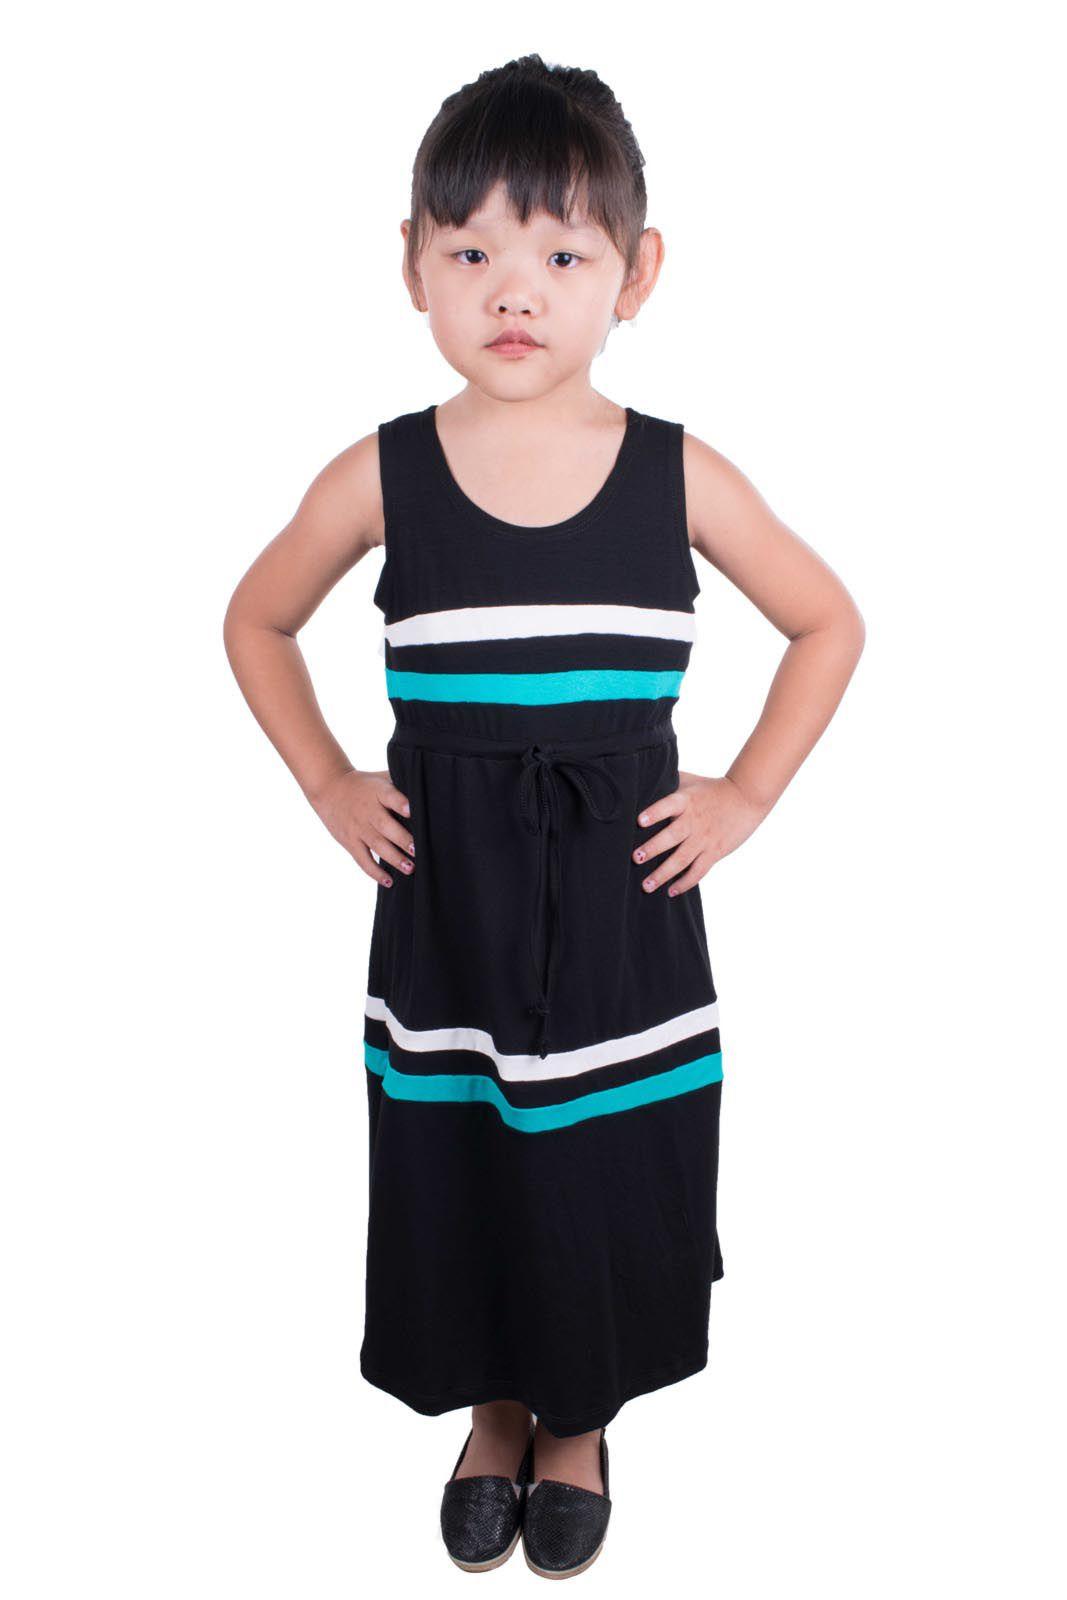 Vestido Outlet Dri Infantil Detalhe 3 Cores Listras Tiras Amarrar Preto